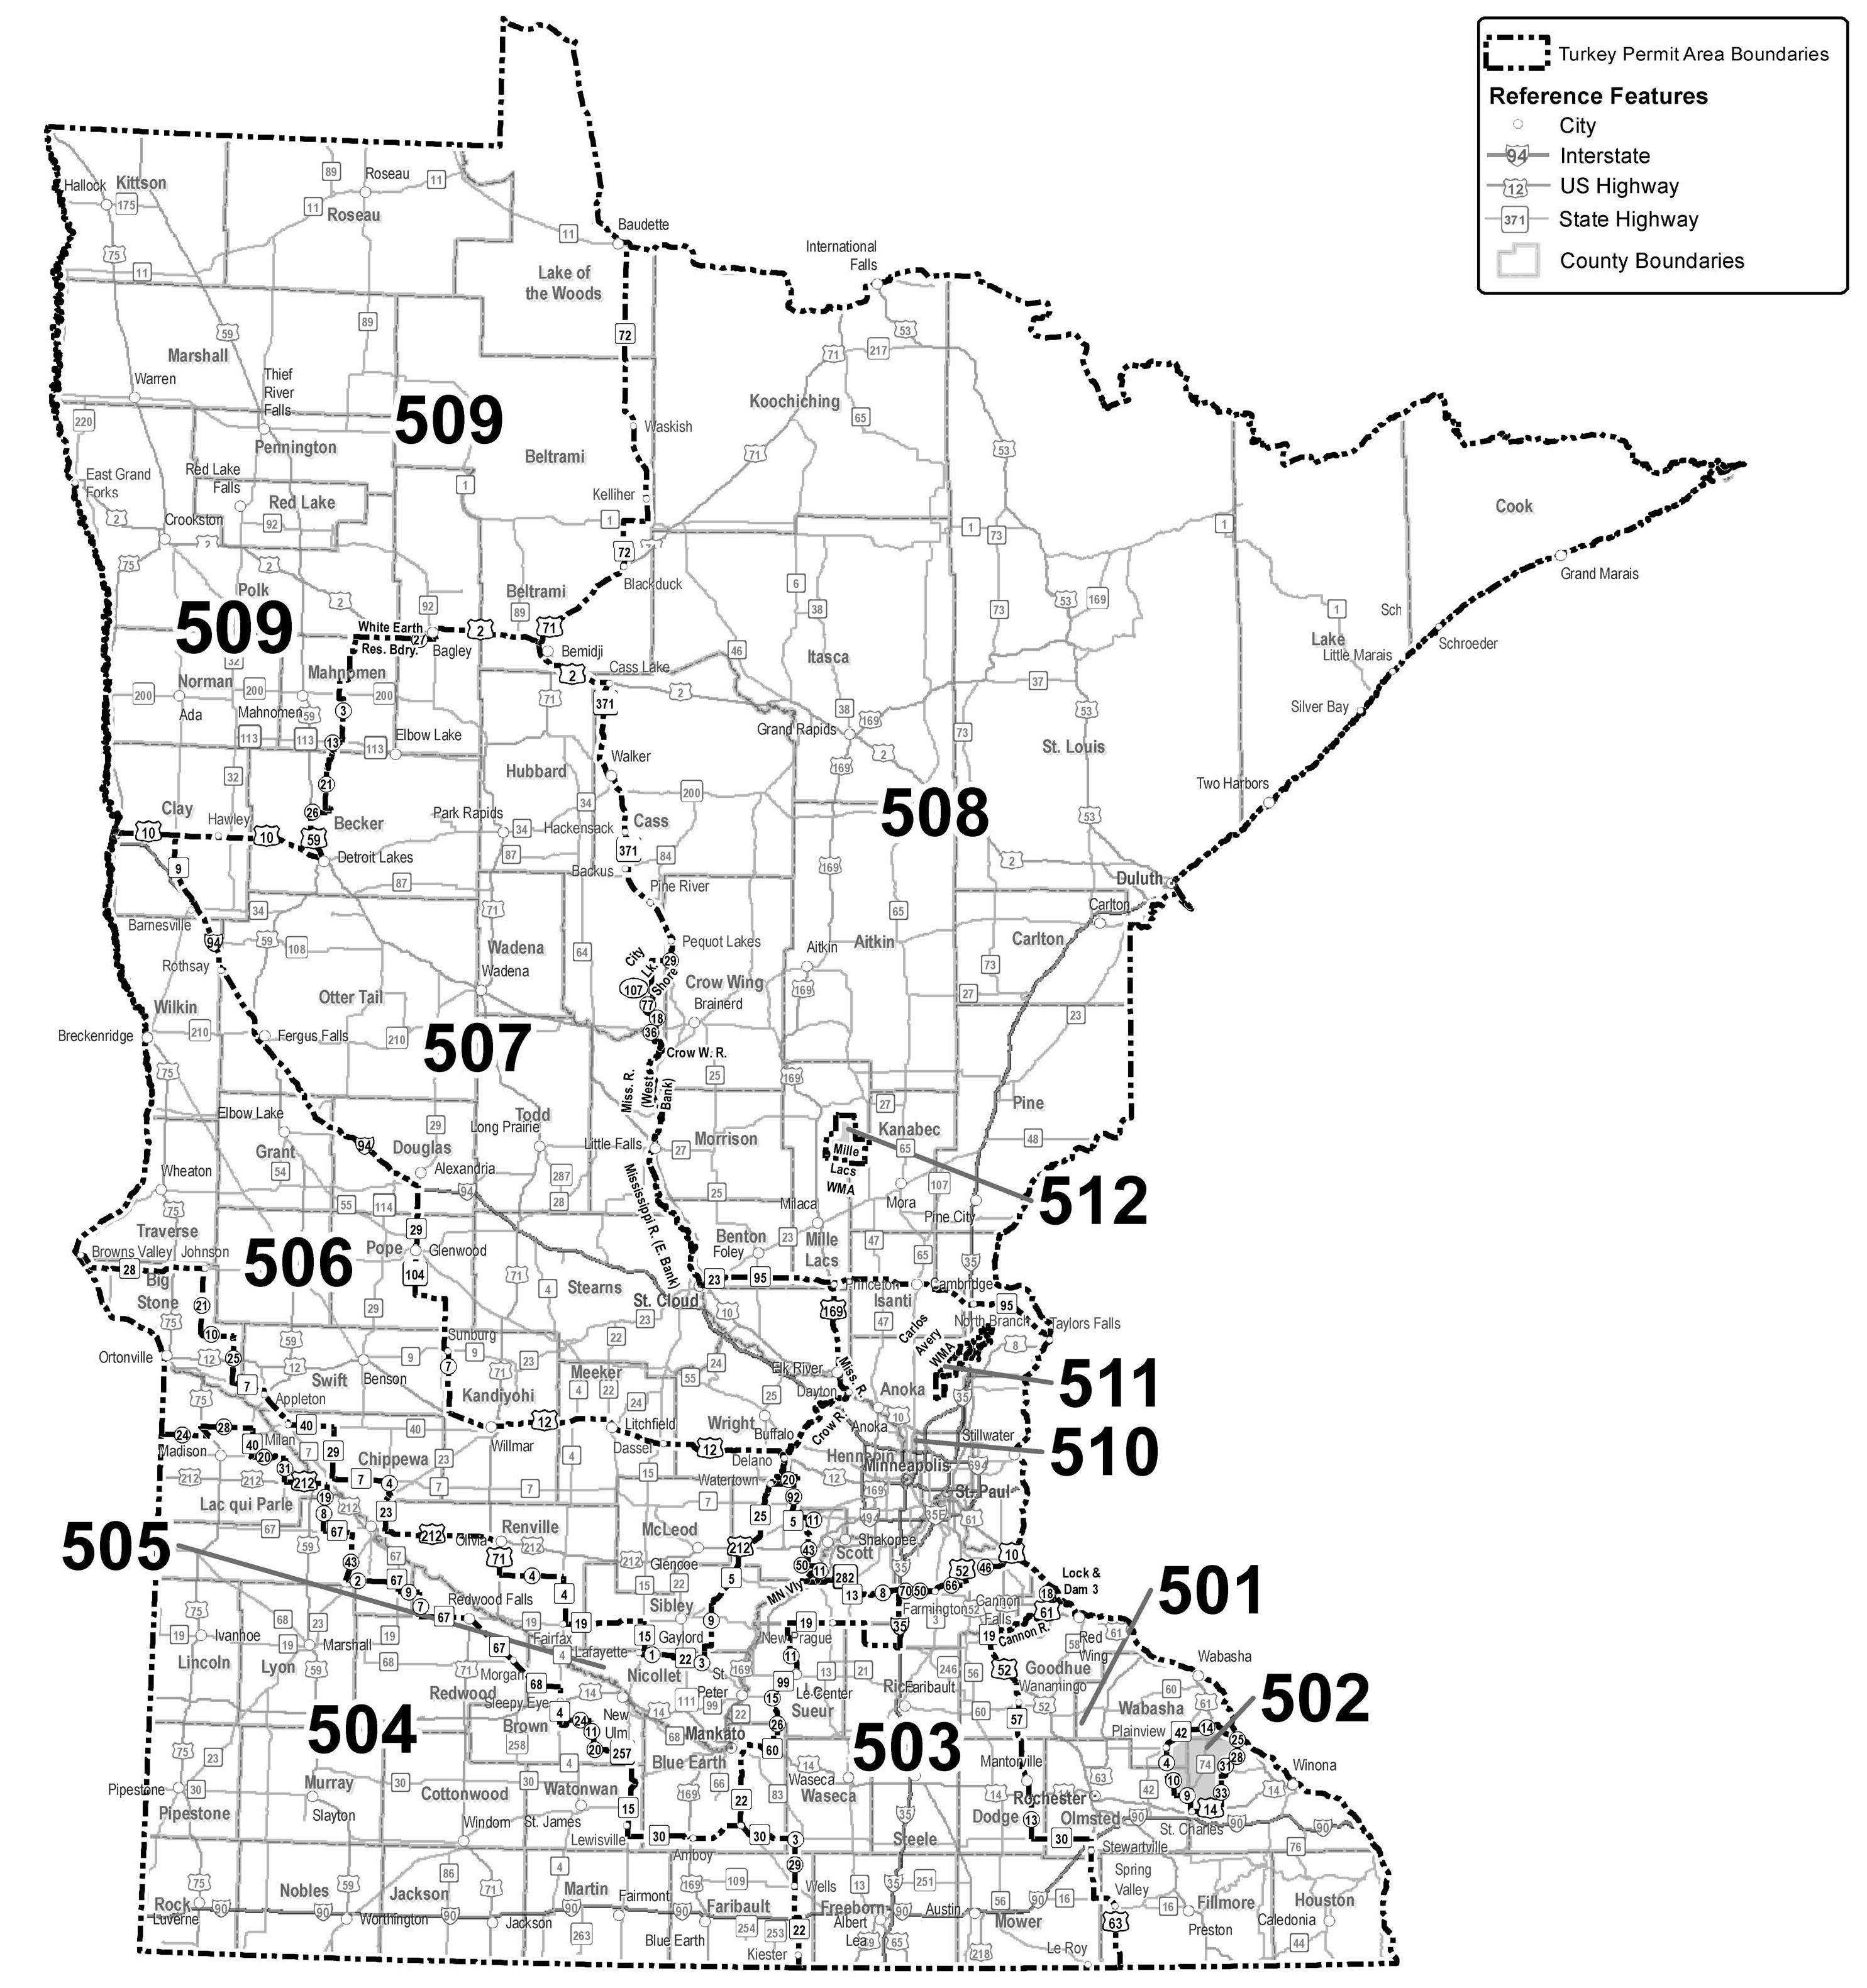 Map showing boundaries of Minnesota's wild turkey permit areas.